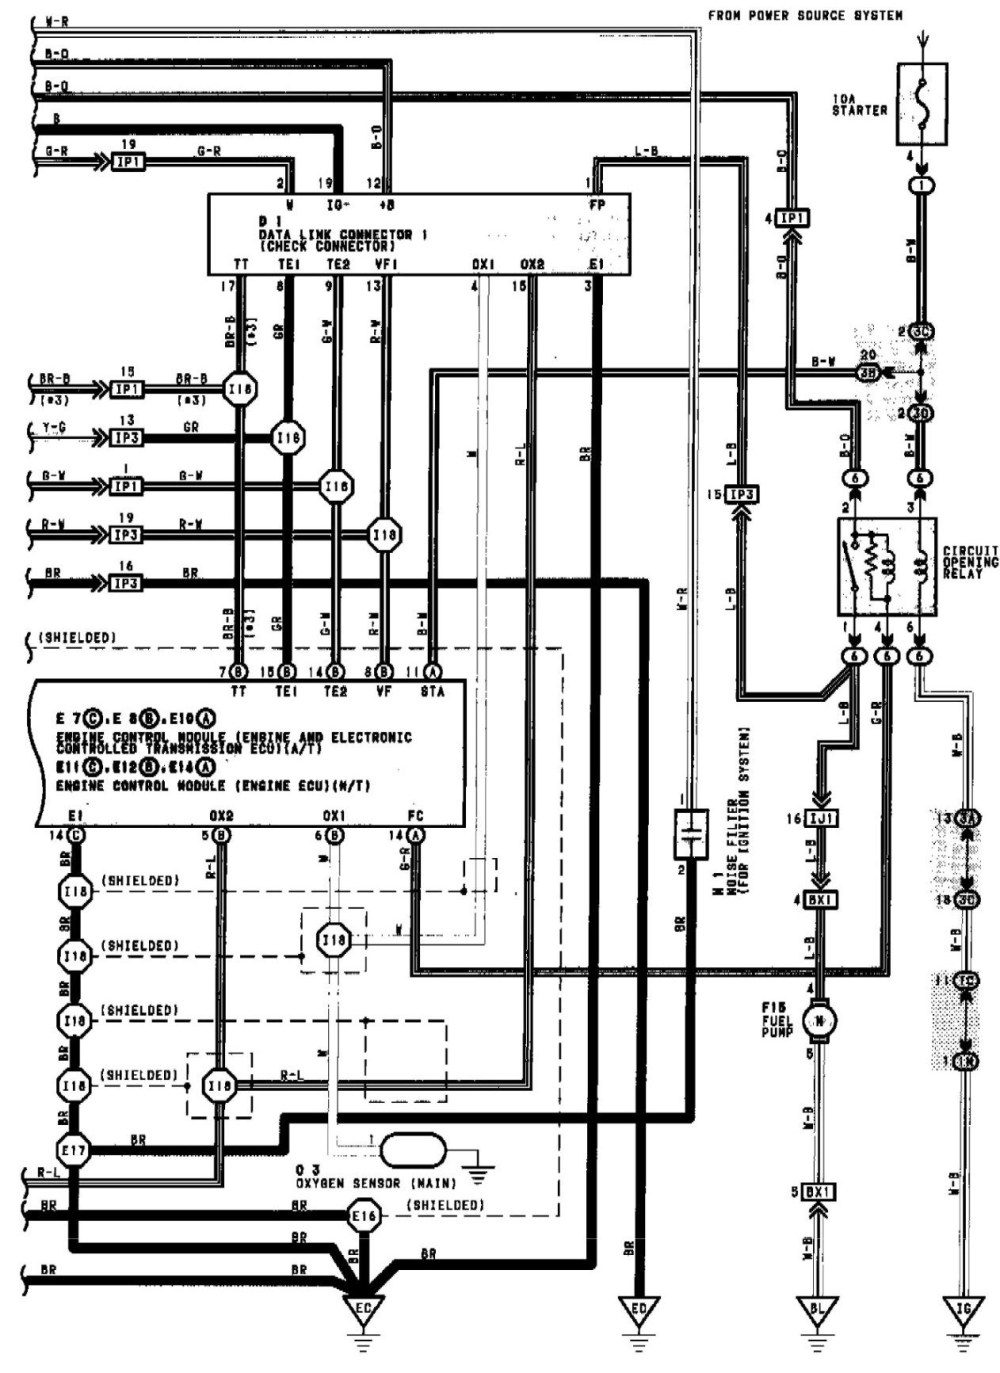 medium resolution of 94 toyota wiring diagram wiring diagram data today 1994 toyota wiring diagram 1994 toyota camry wiring